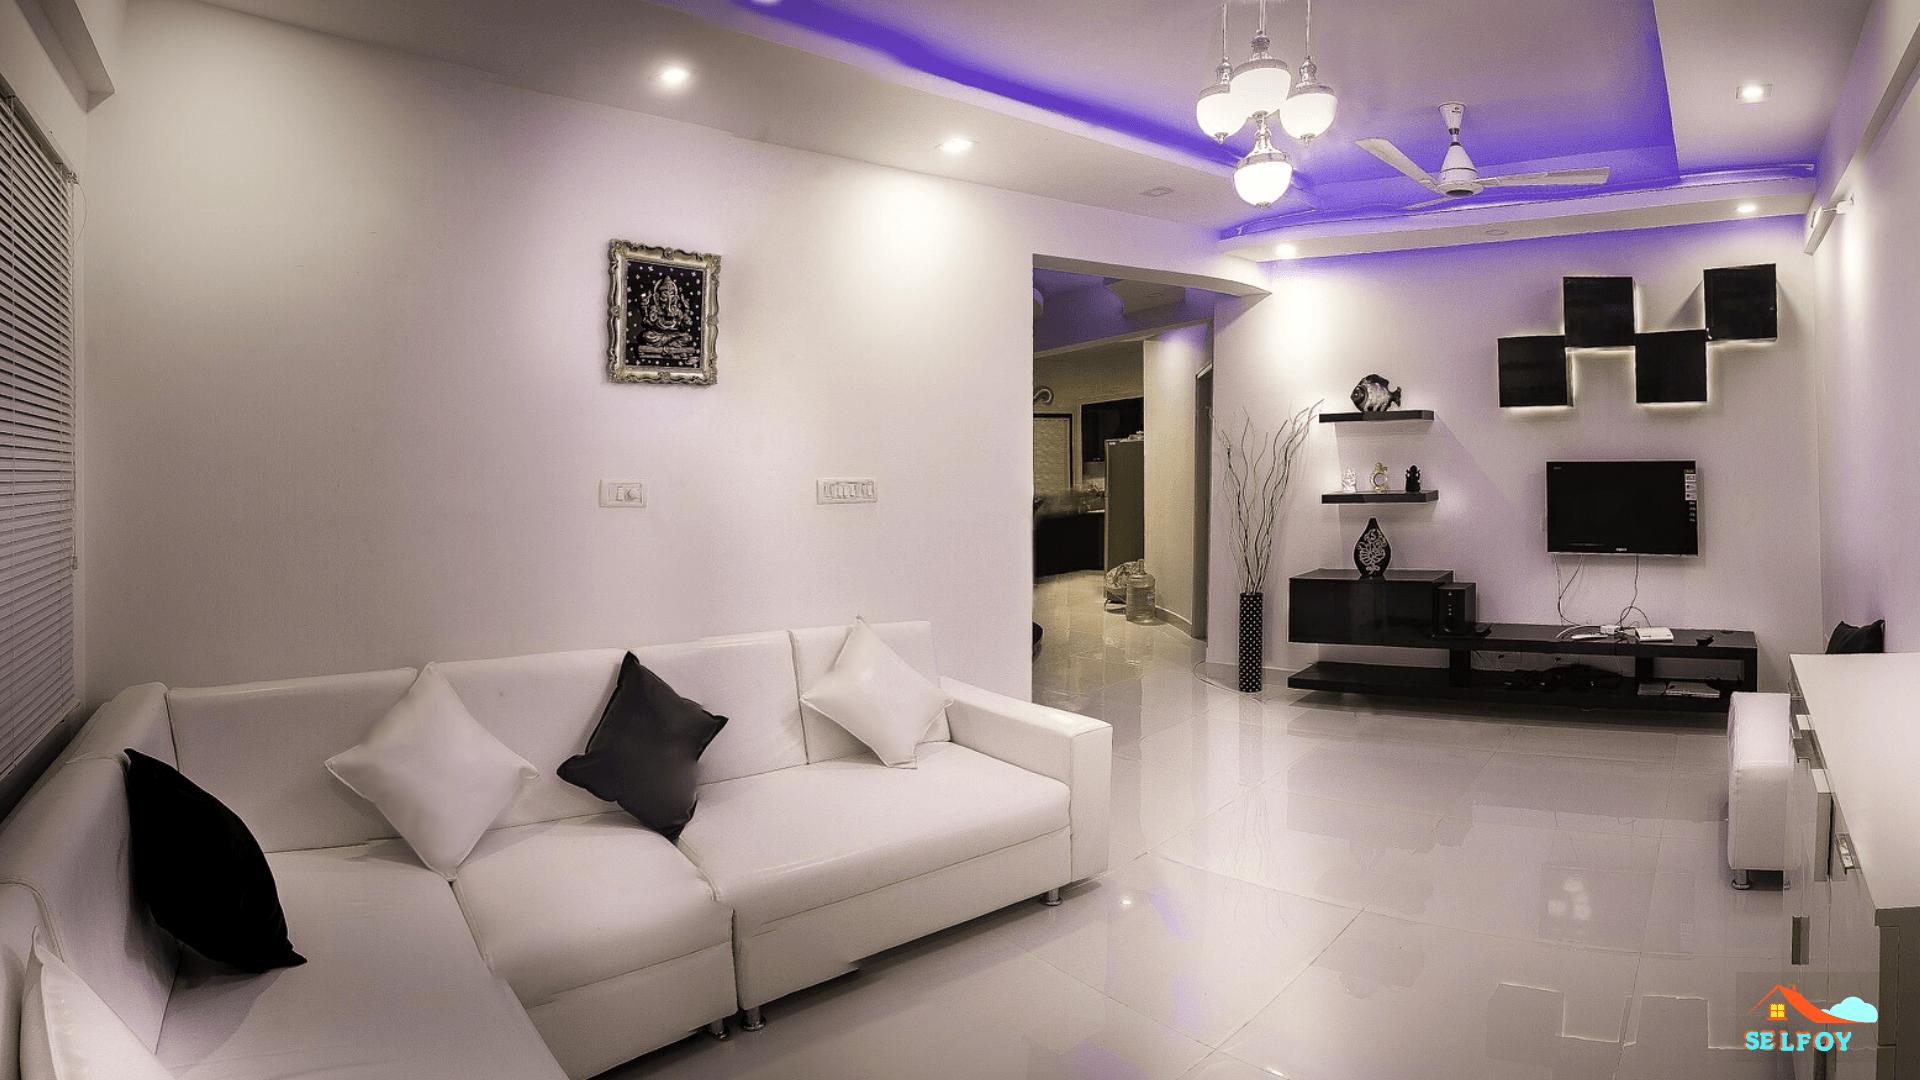 Porcelain tiles flooring with built in vapor barrier